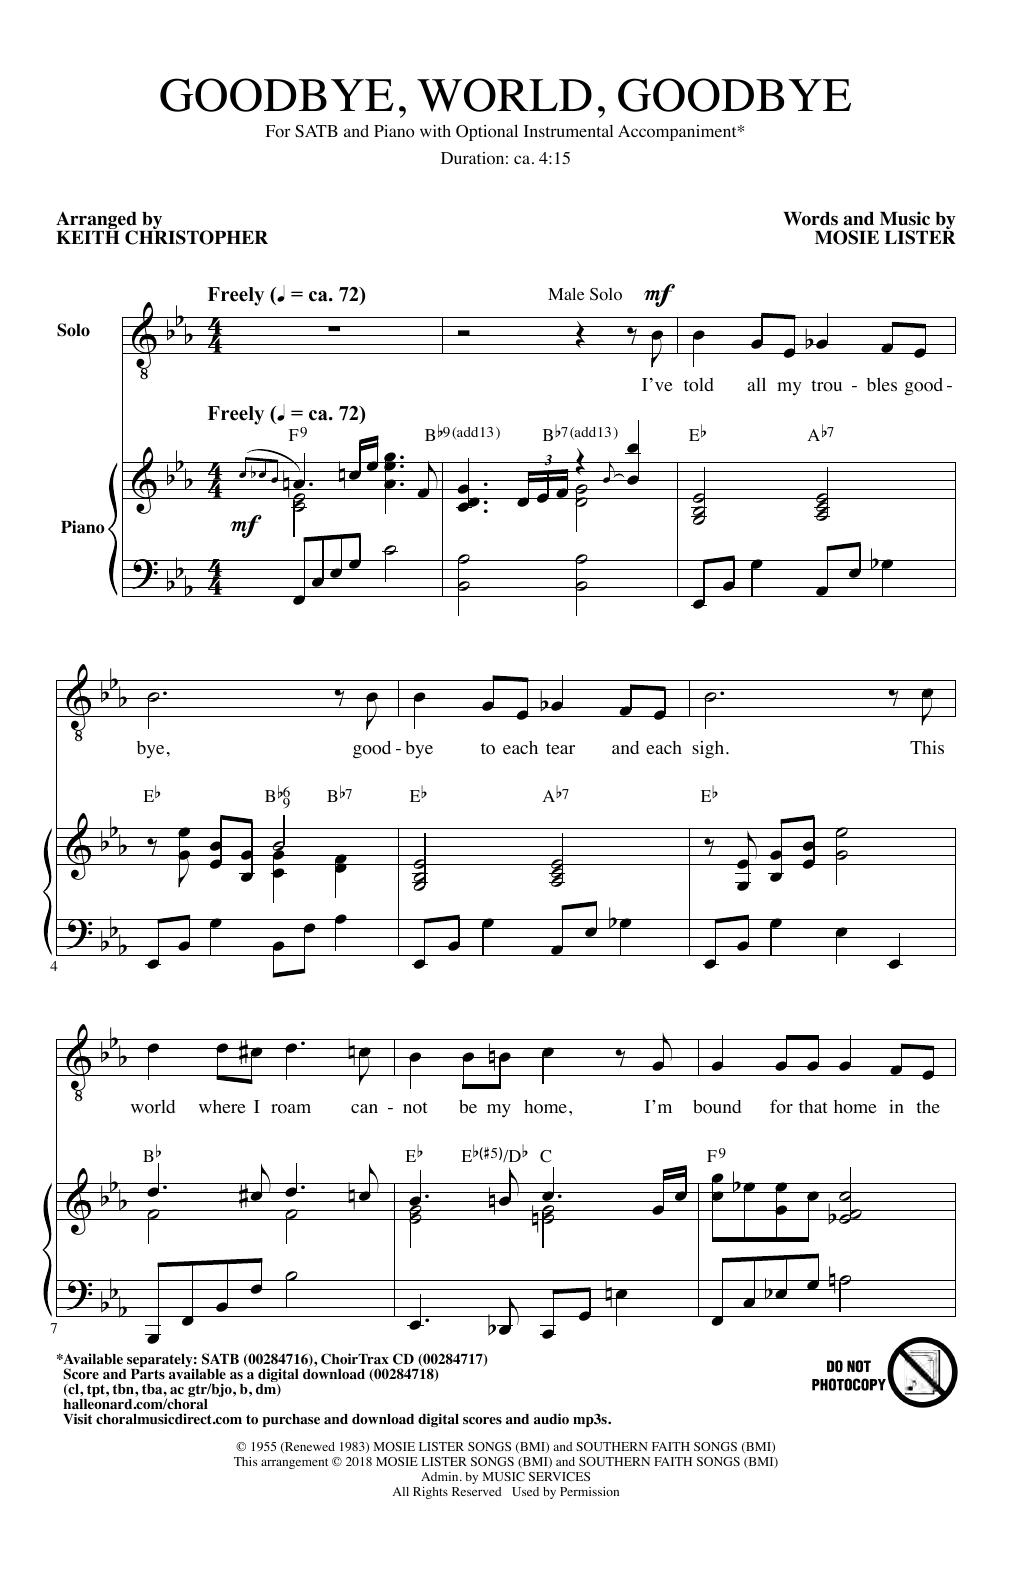 Goodbye World Goodbye (arr. Keith Christopher) (SATB Choir)